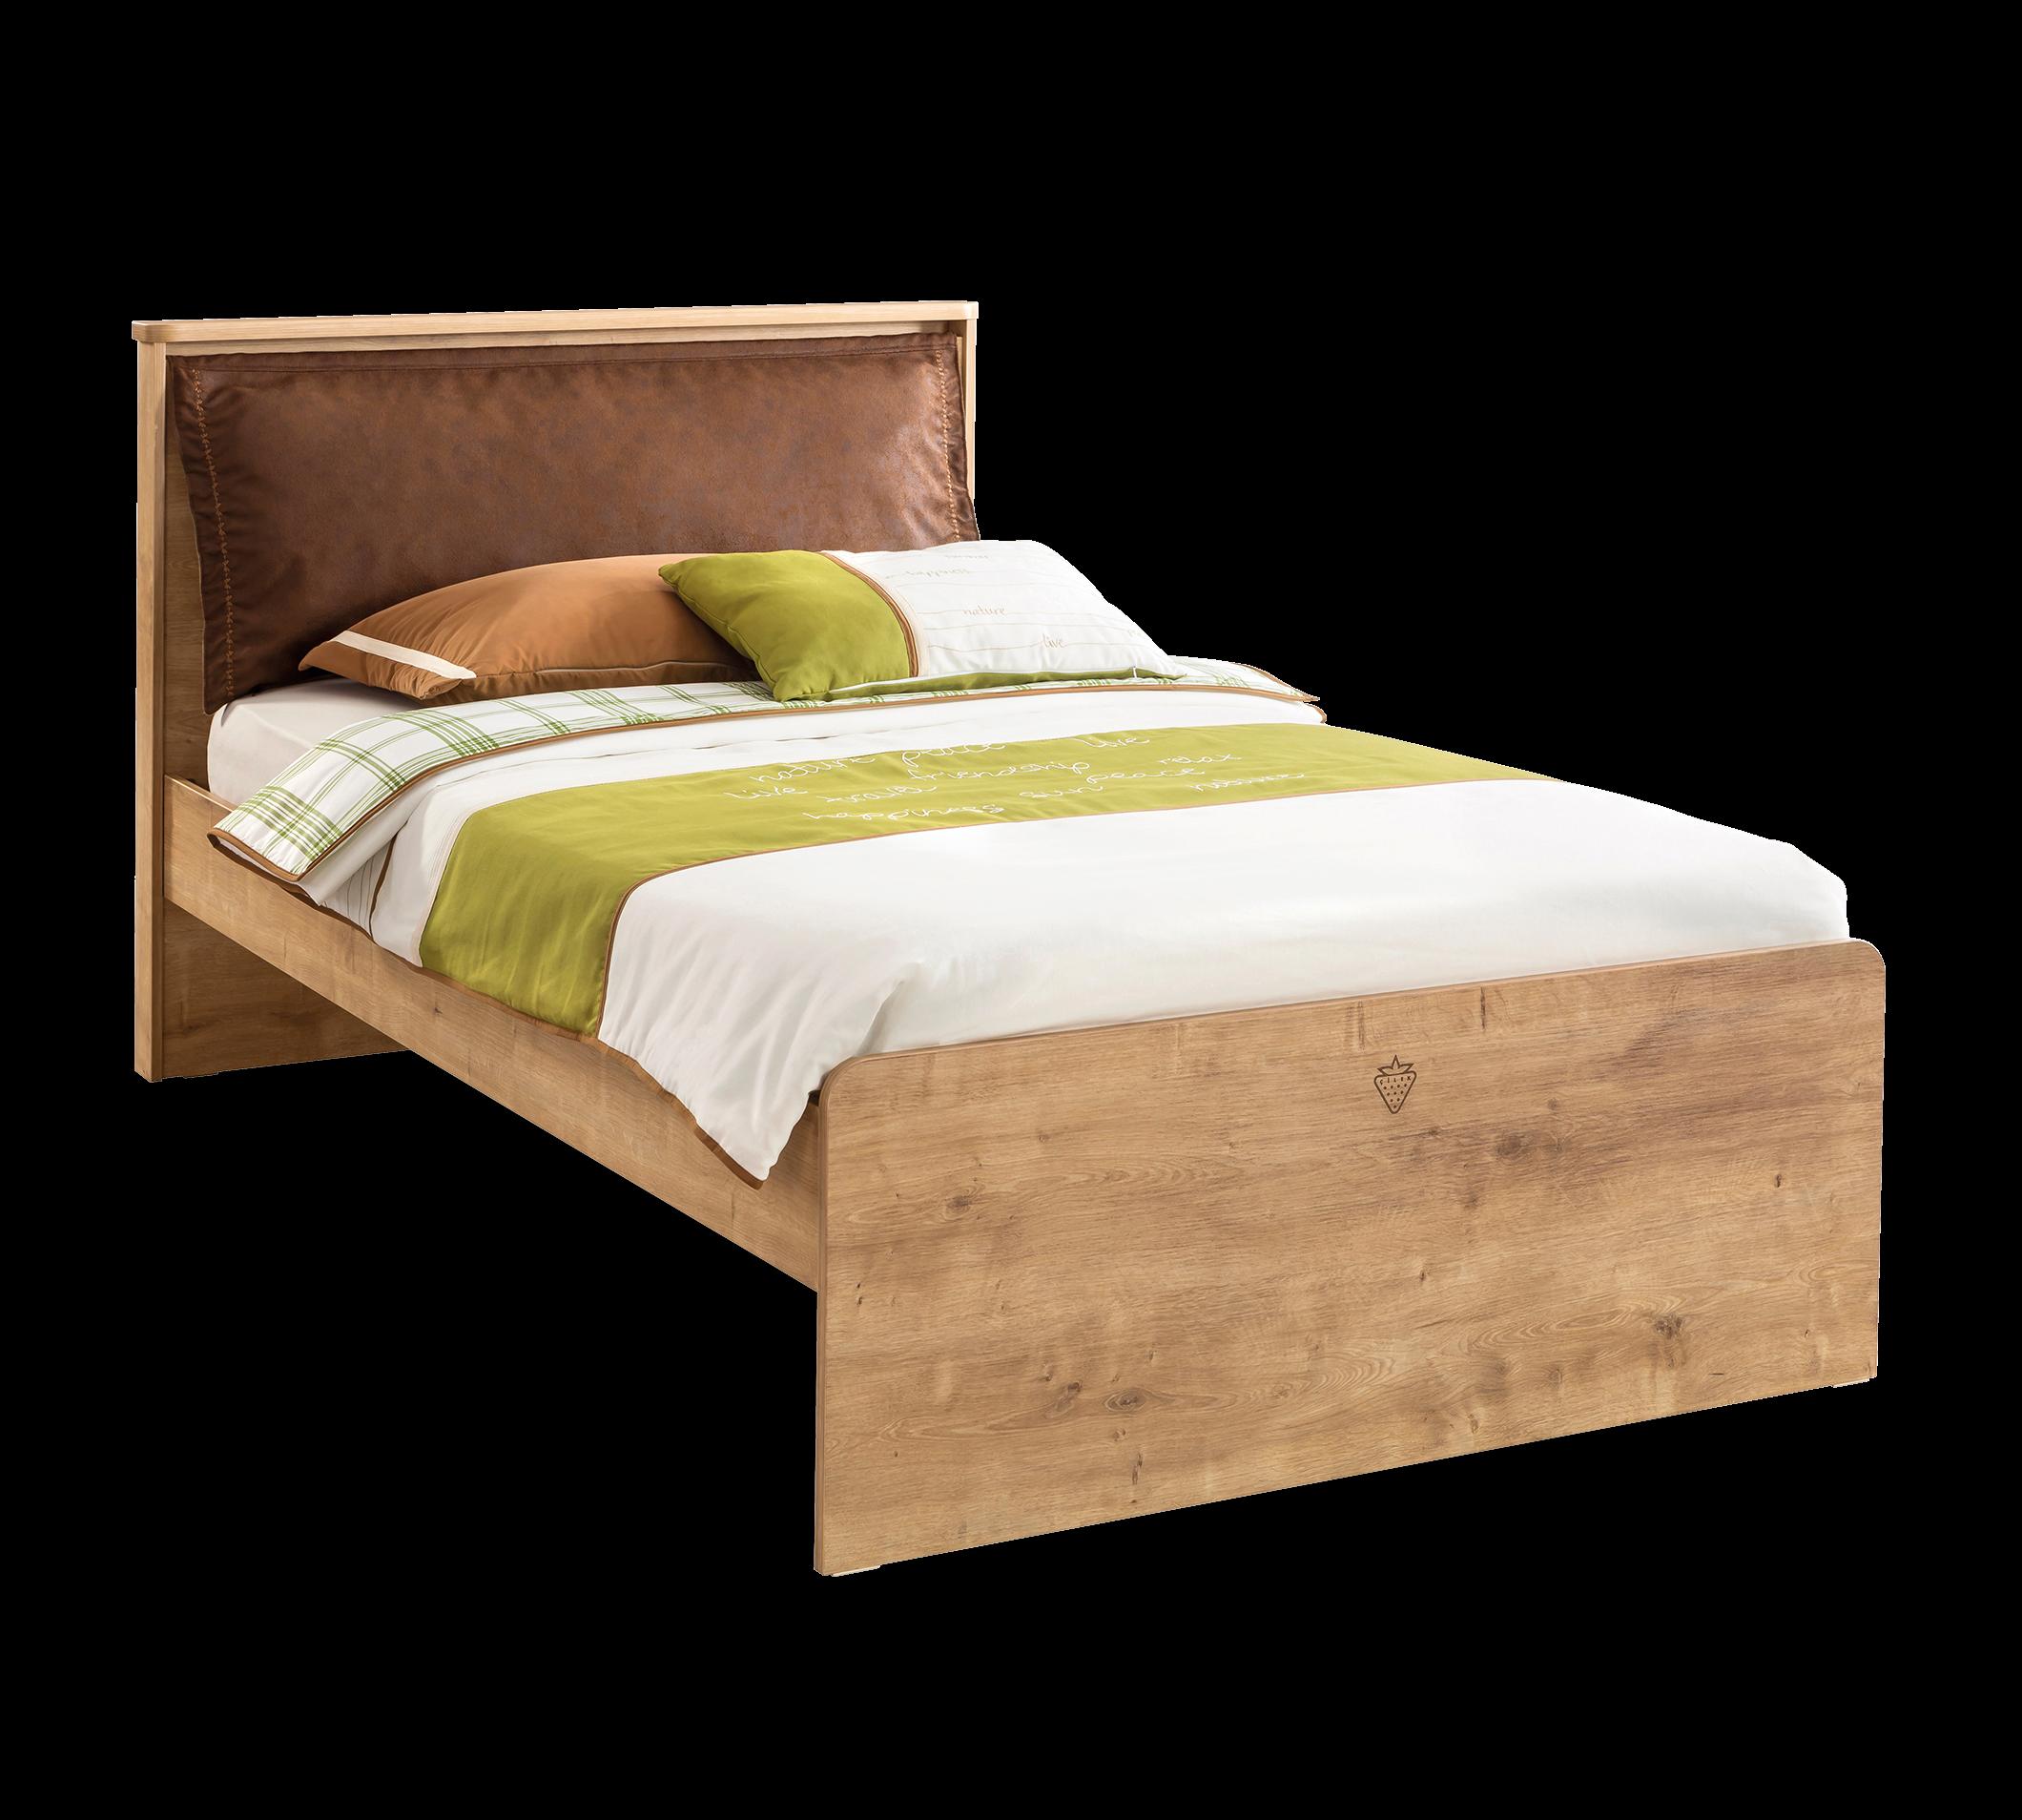 Full Size of Mocha Bett 100x200 Cm Lek 160x220 Massivholz Stabiles Eiche Massiv 180x200 Betten Ikea 160x200 Somnus Halbhohes Mit Matratze Und Lattenrost 140x200 Bett Bett 100x200